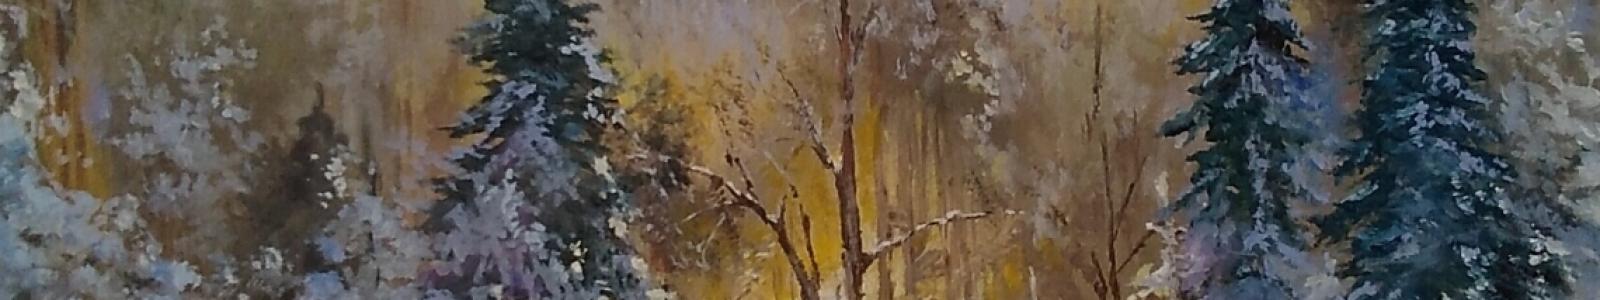 Gallery Painter Yury Apoyants